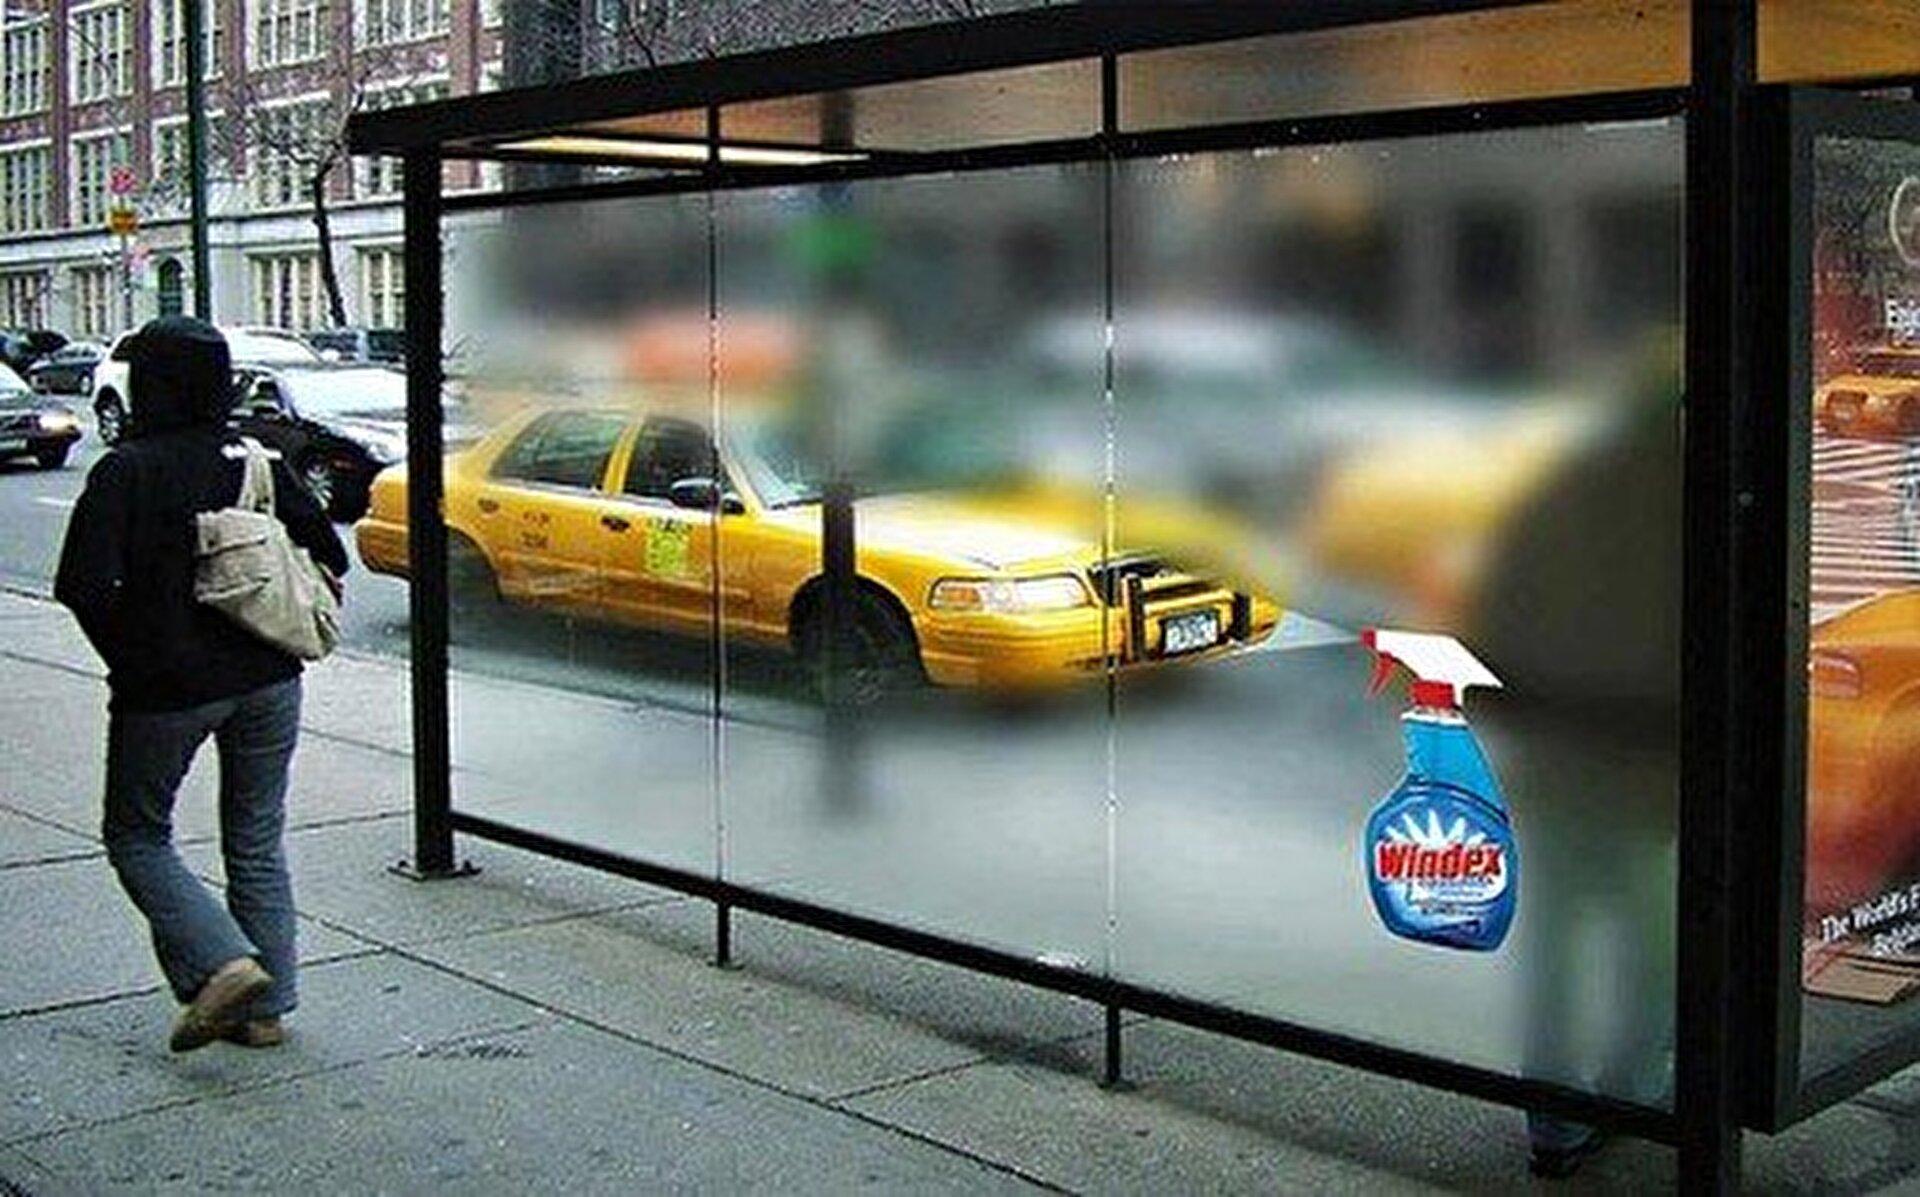 Impressive street commercials of world-famous brands